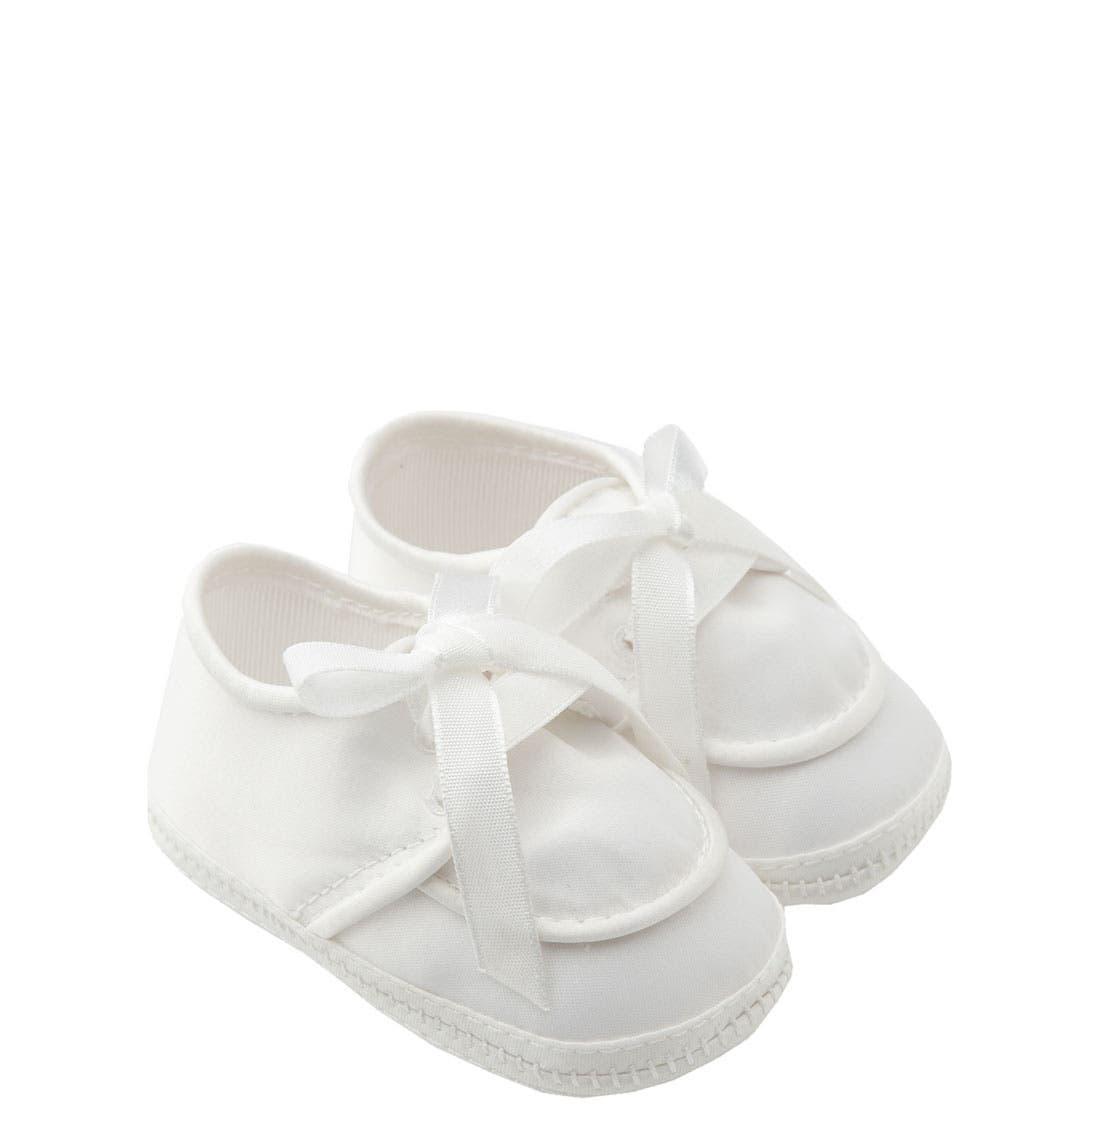 Main Image - Designer's Touch 'Michael' Crib Shoe (Baby)